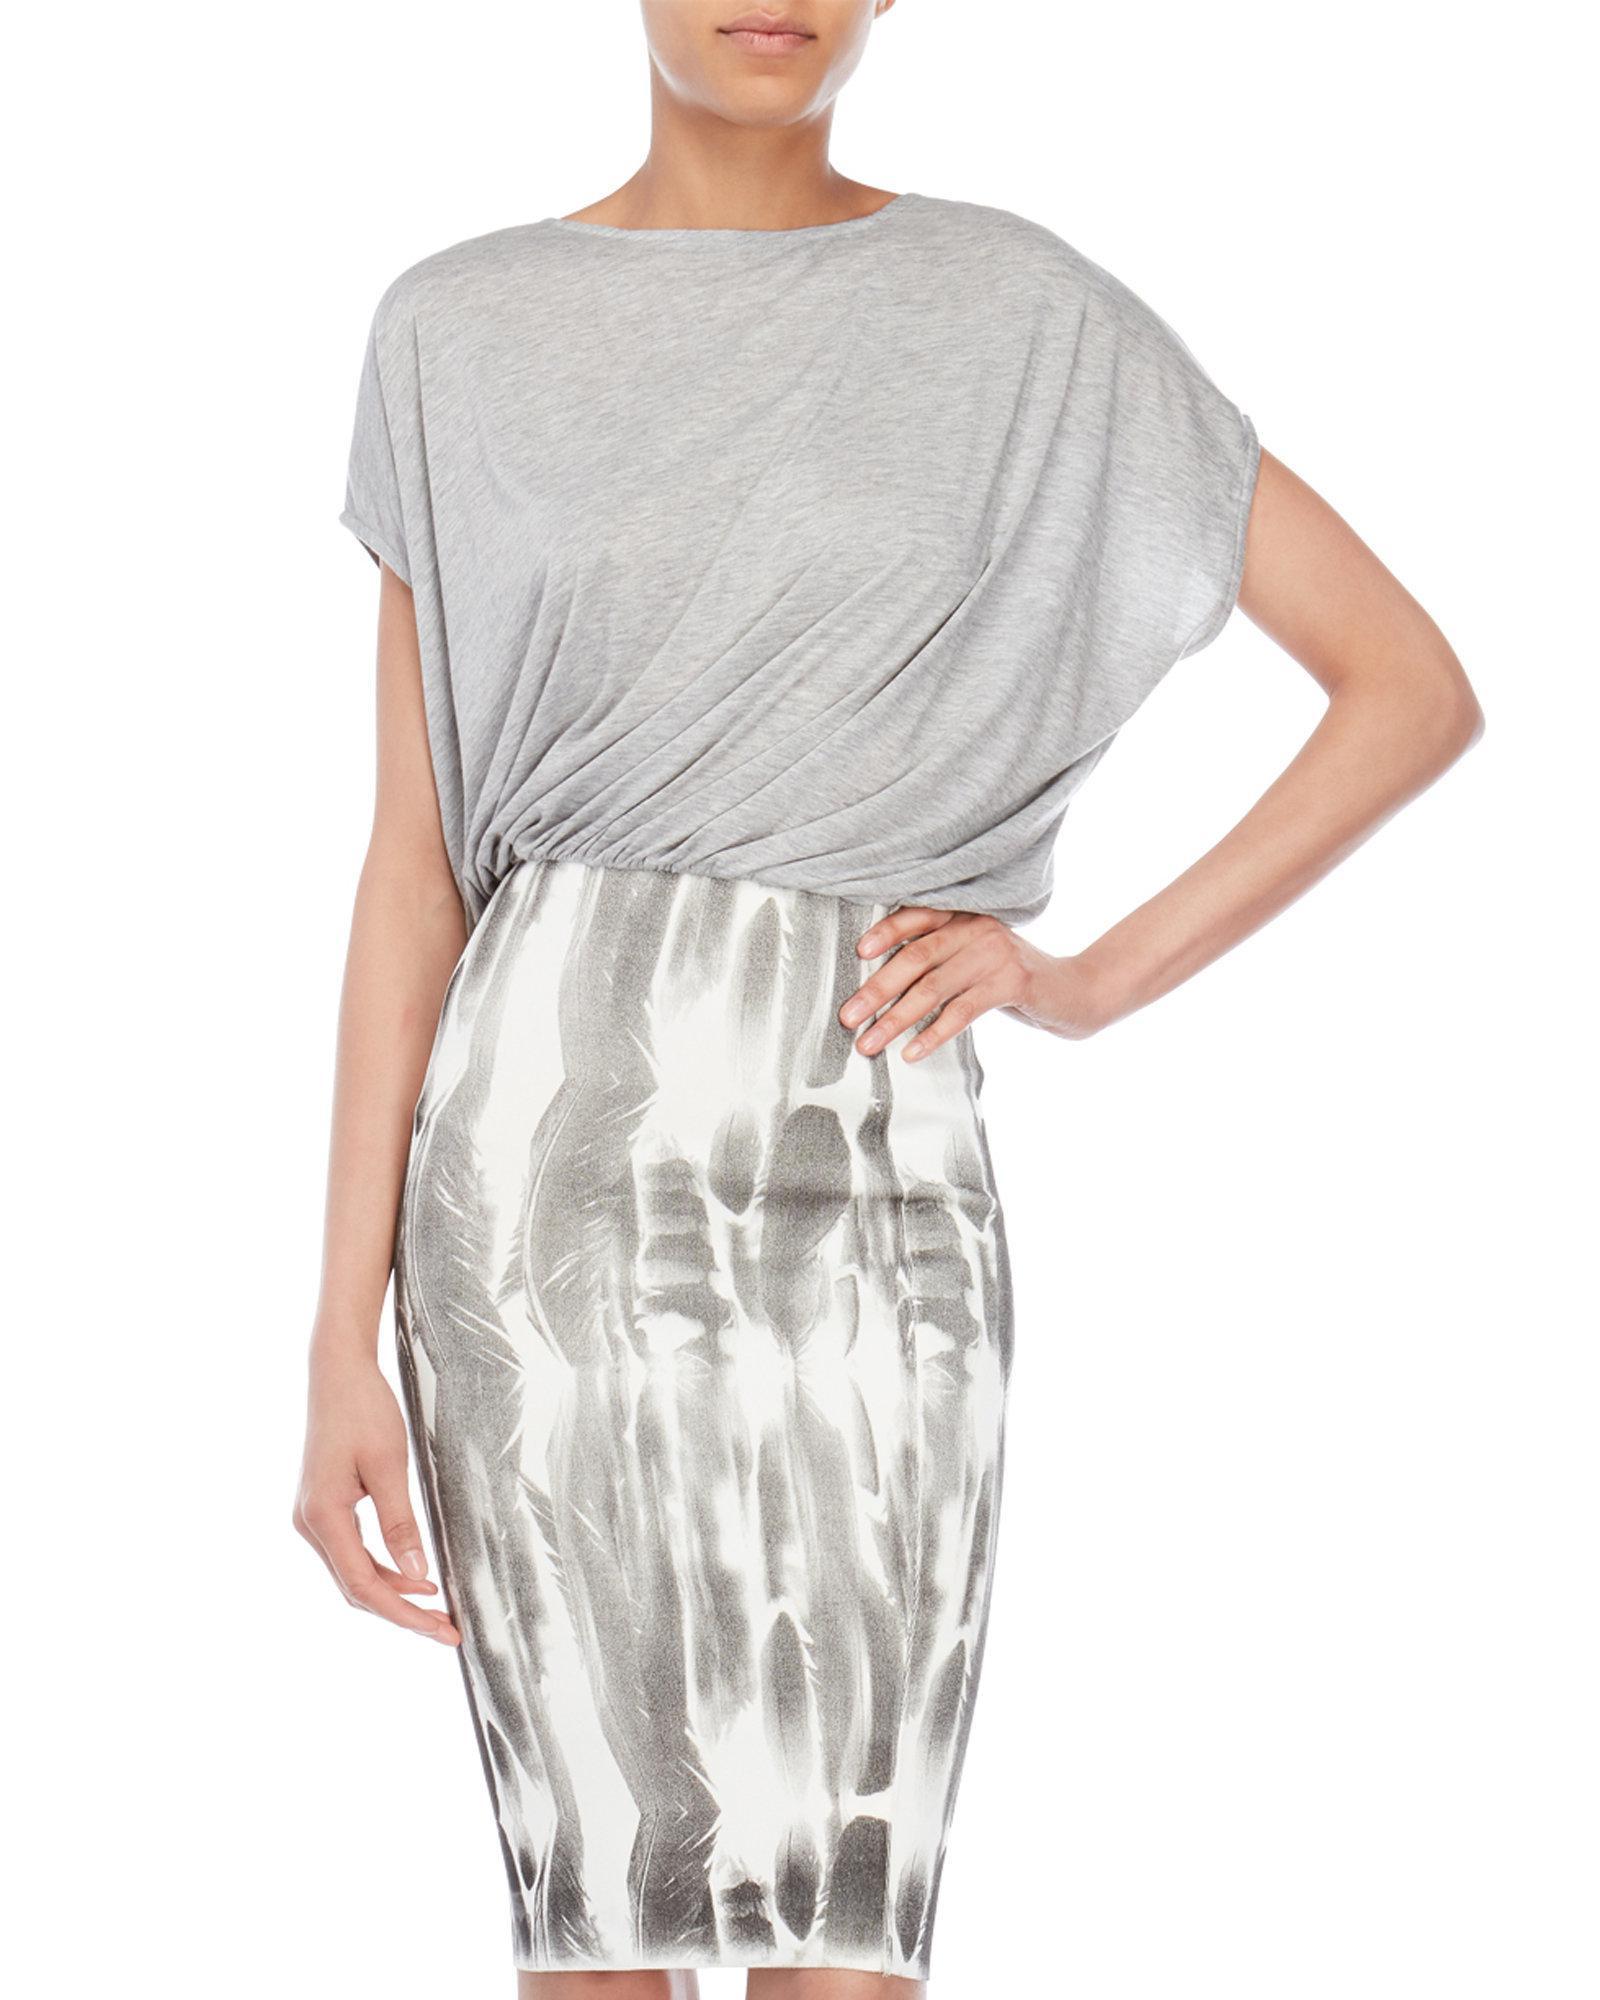 90b9b44d95 Lyst - Faith Connexion Feather Print Sheath Dress in Gray